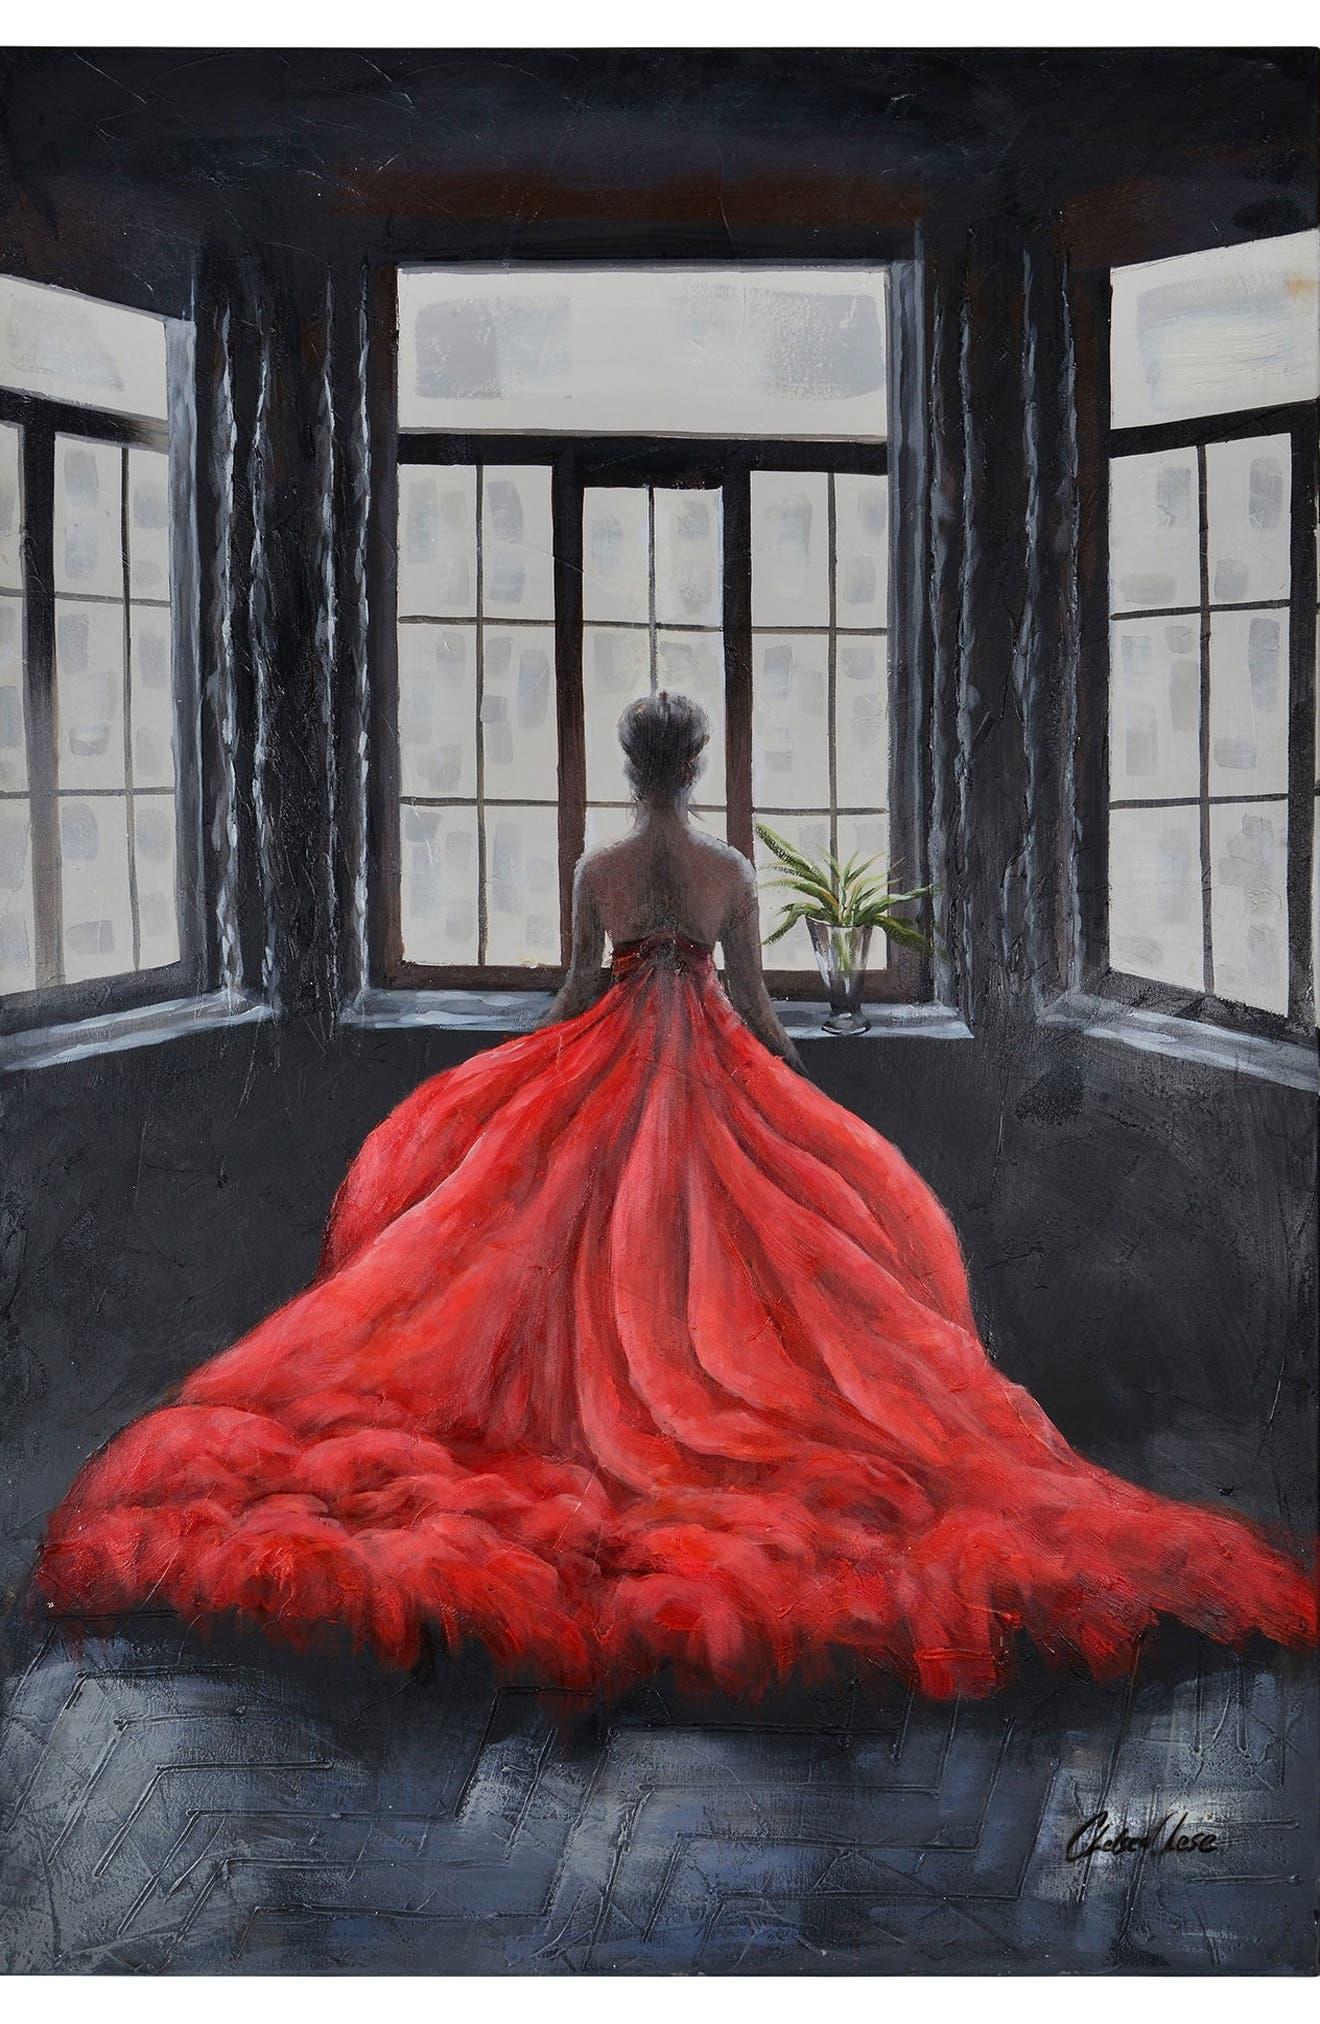 Main Image - Renwil Marbella Canvas Art